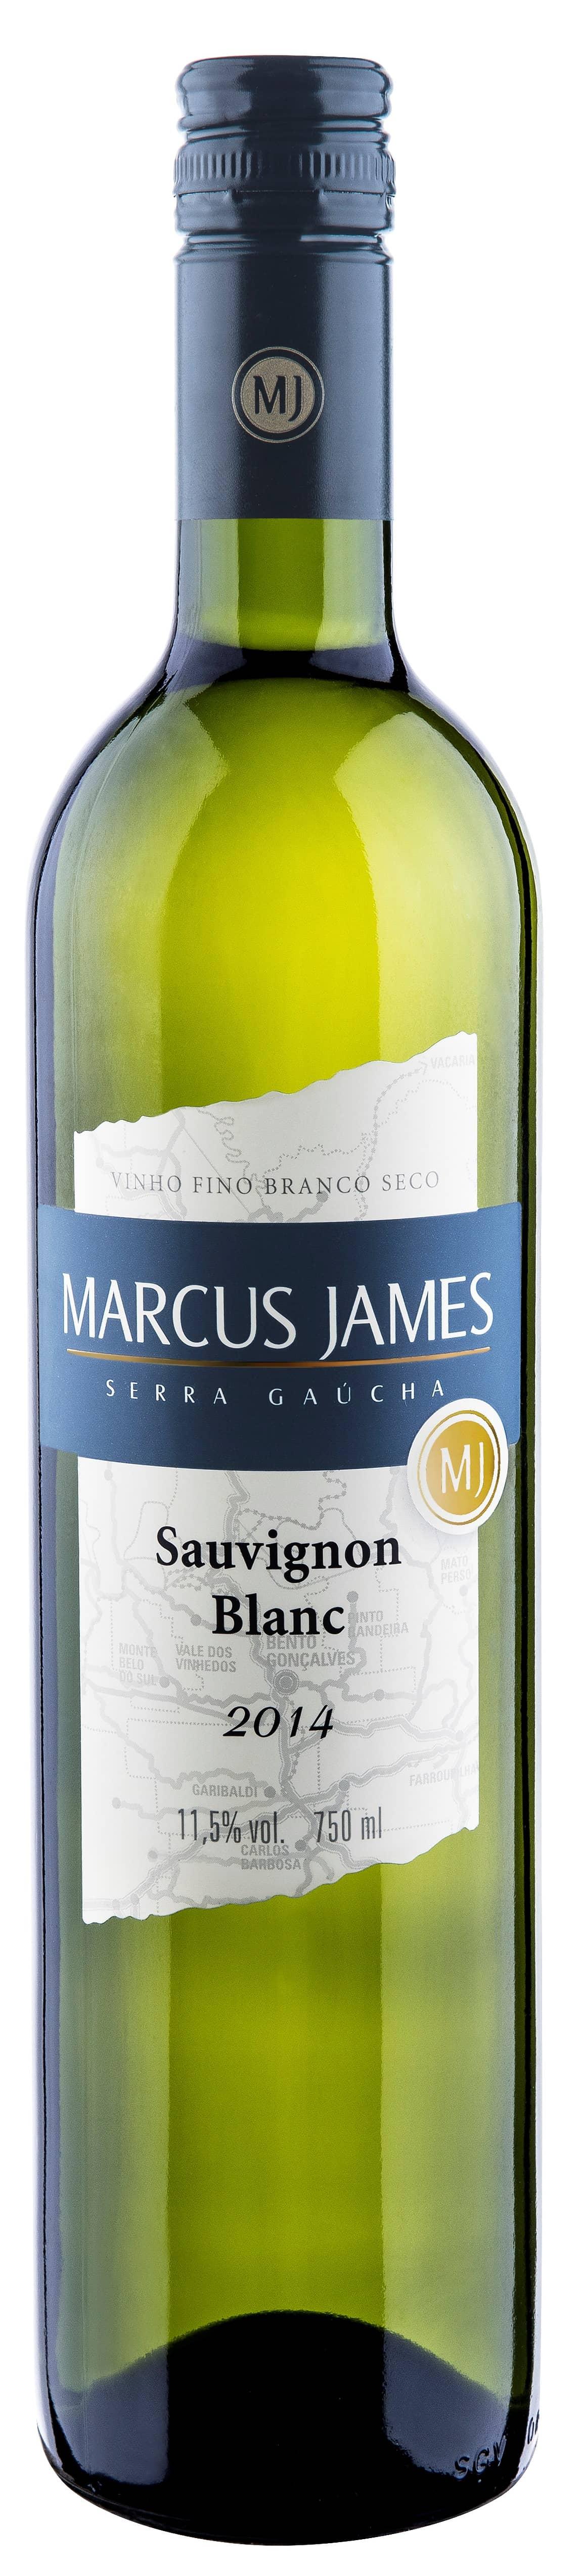 Marcus-James-Sauvignon-Blanc